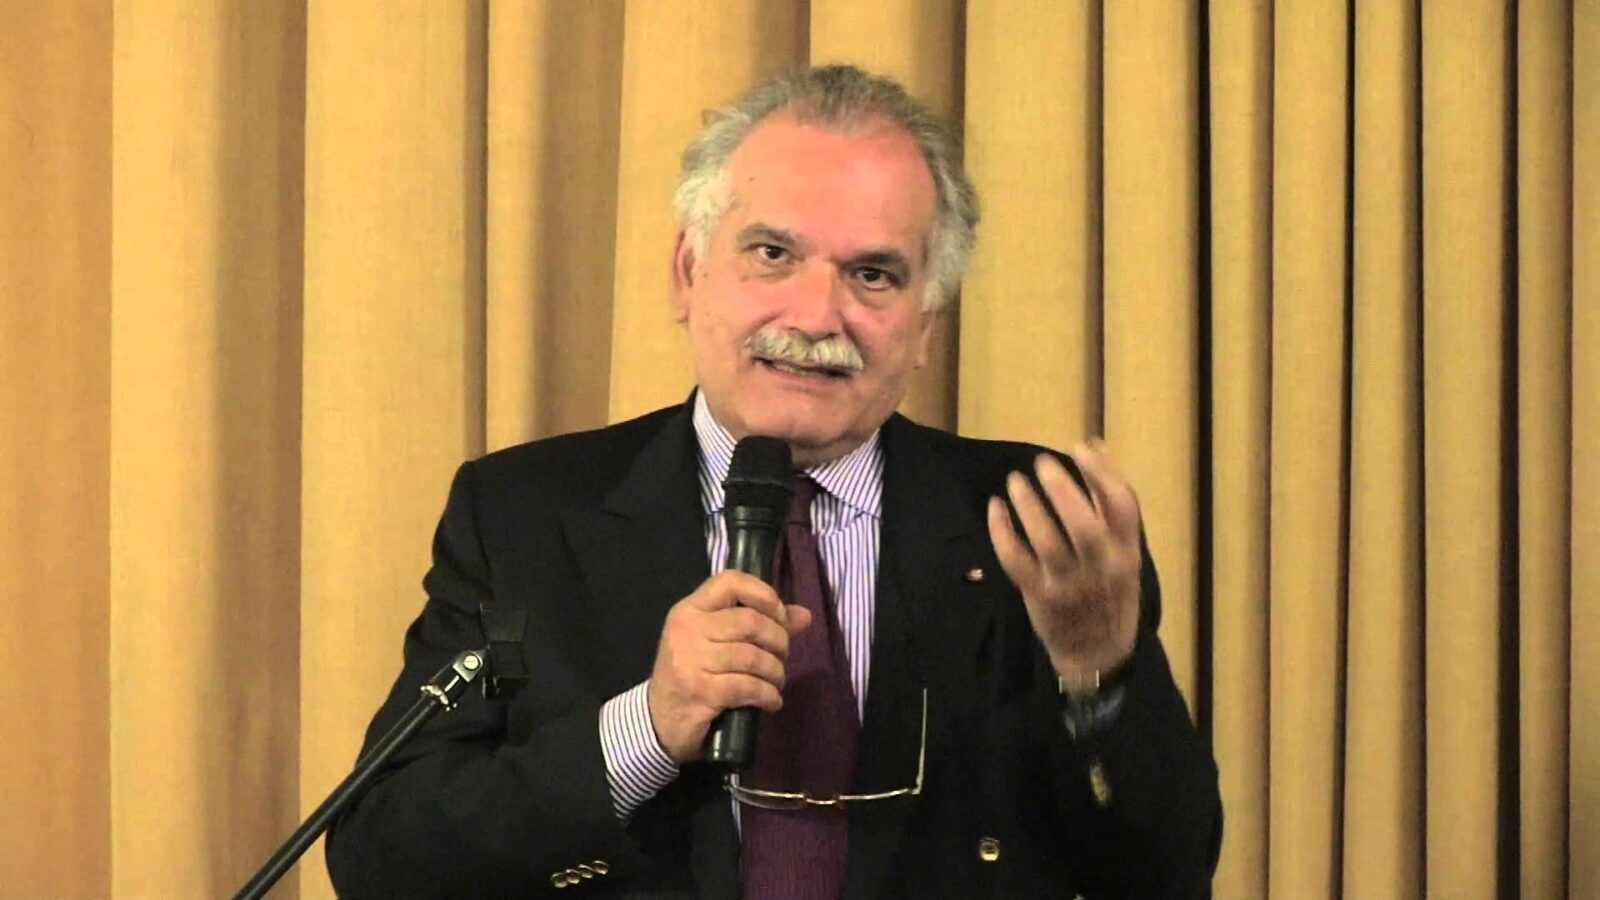 Giampiero Cardillo